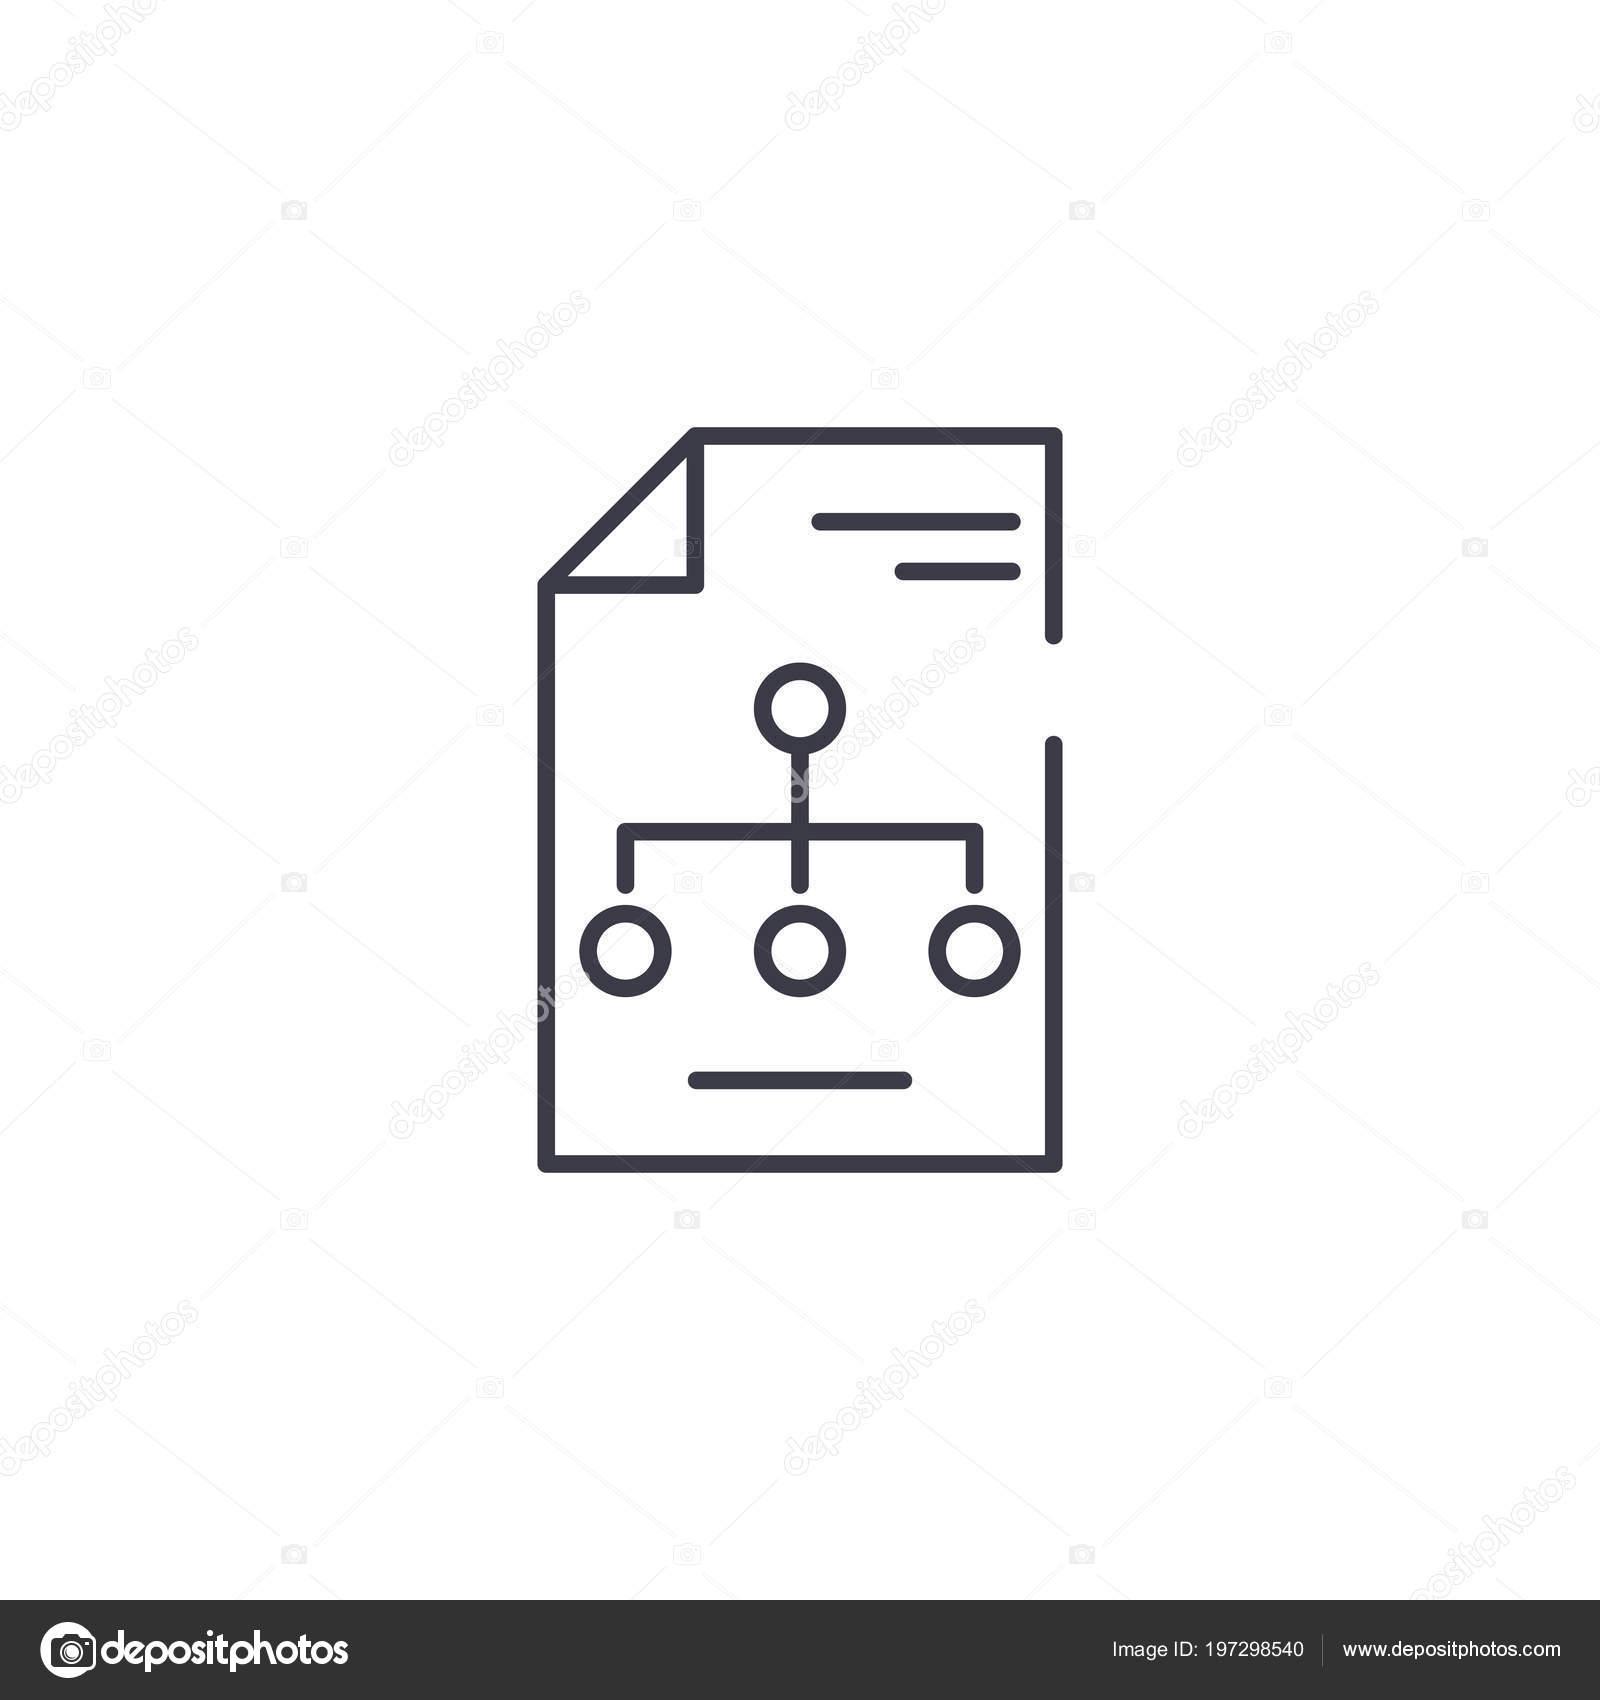 Concepto De Estructura Organizativa Lineal Icono Estructura